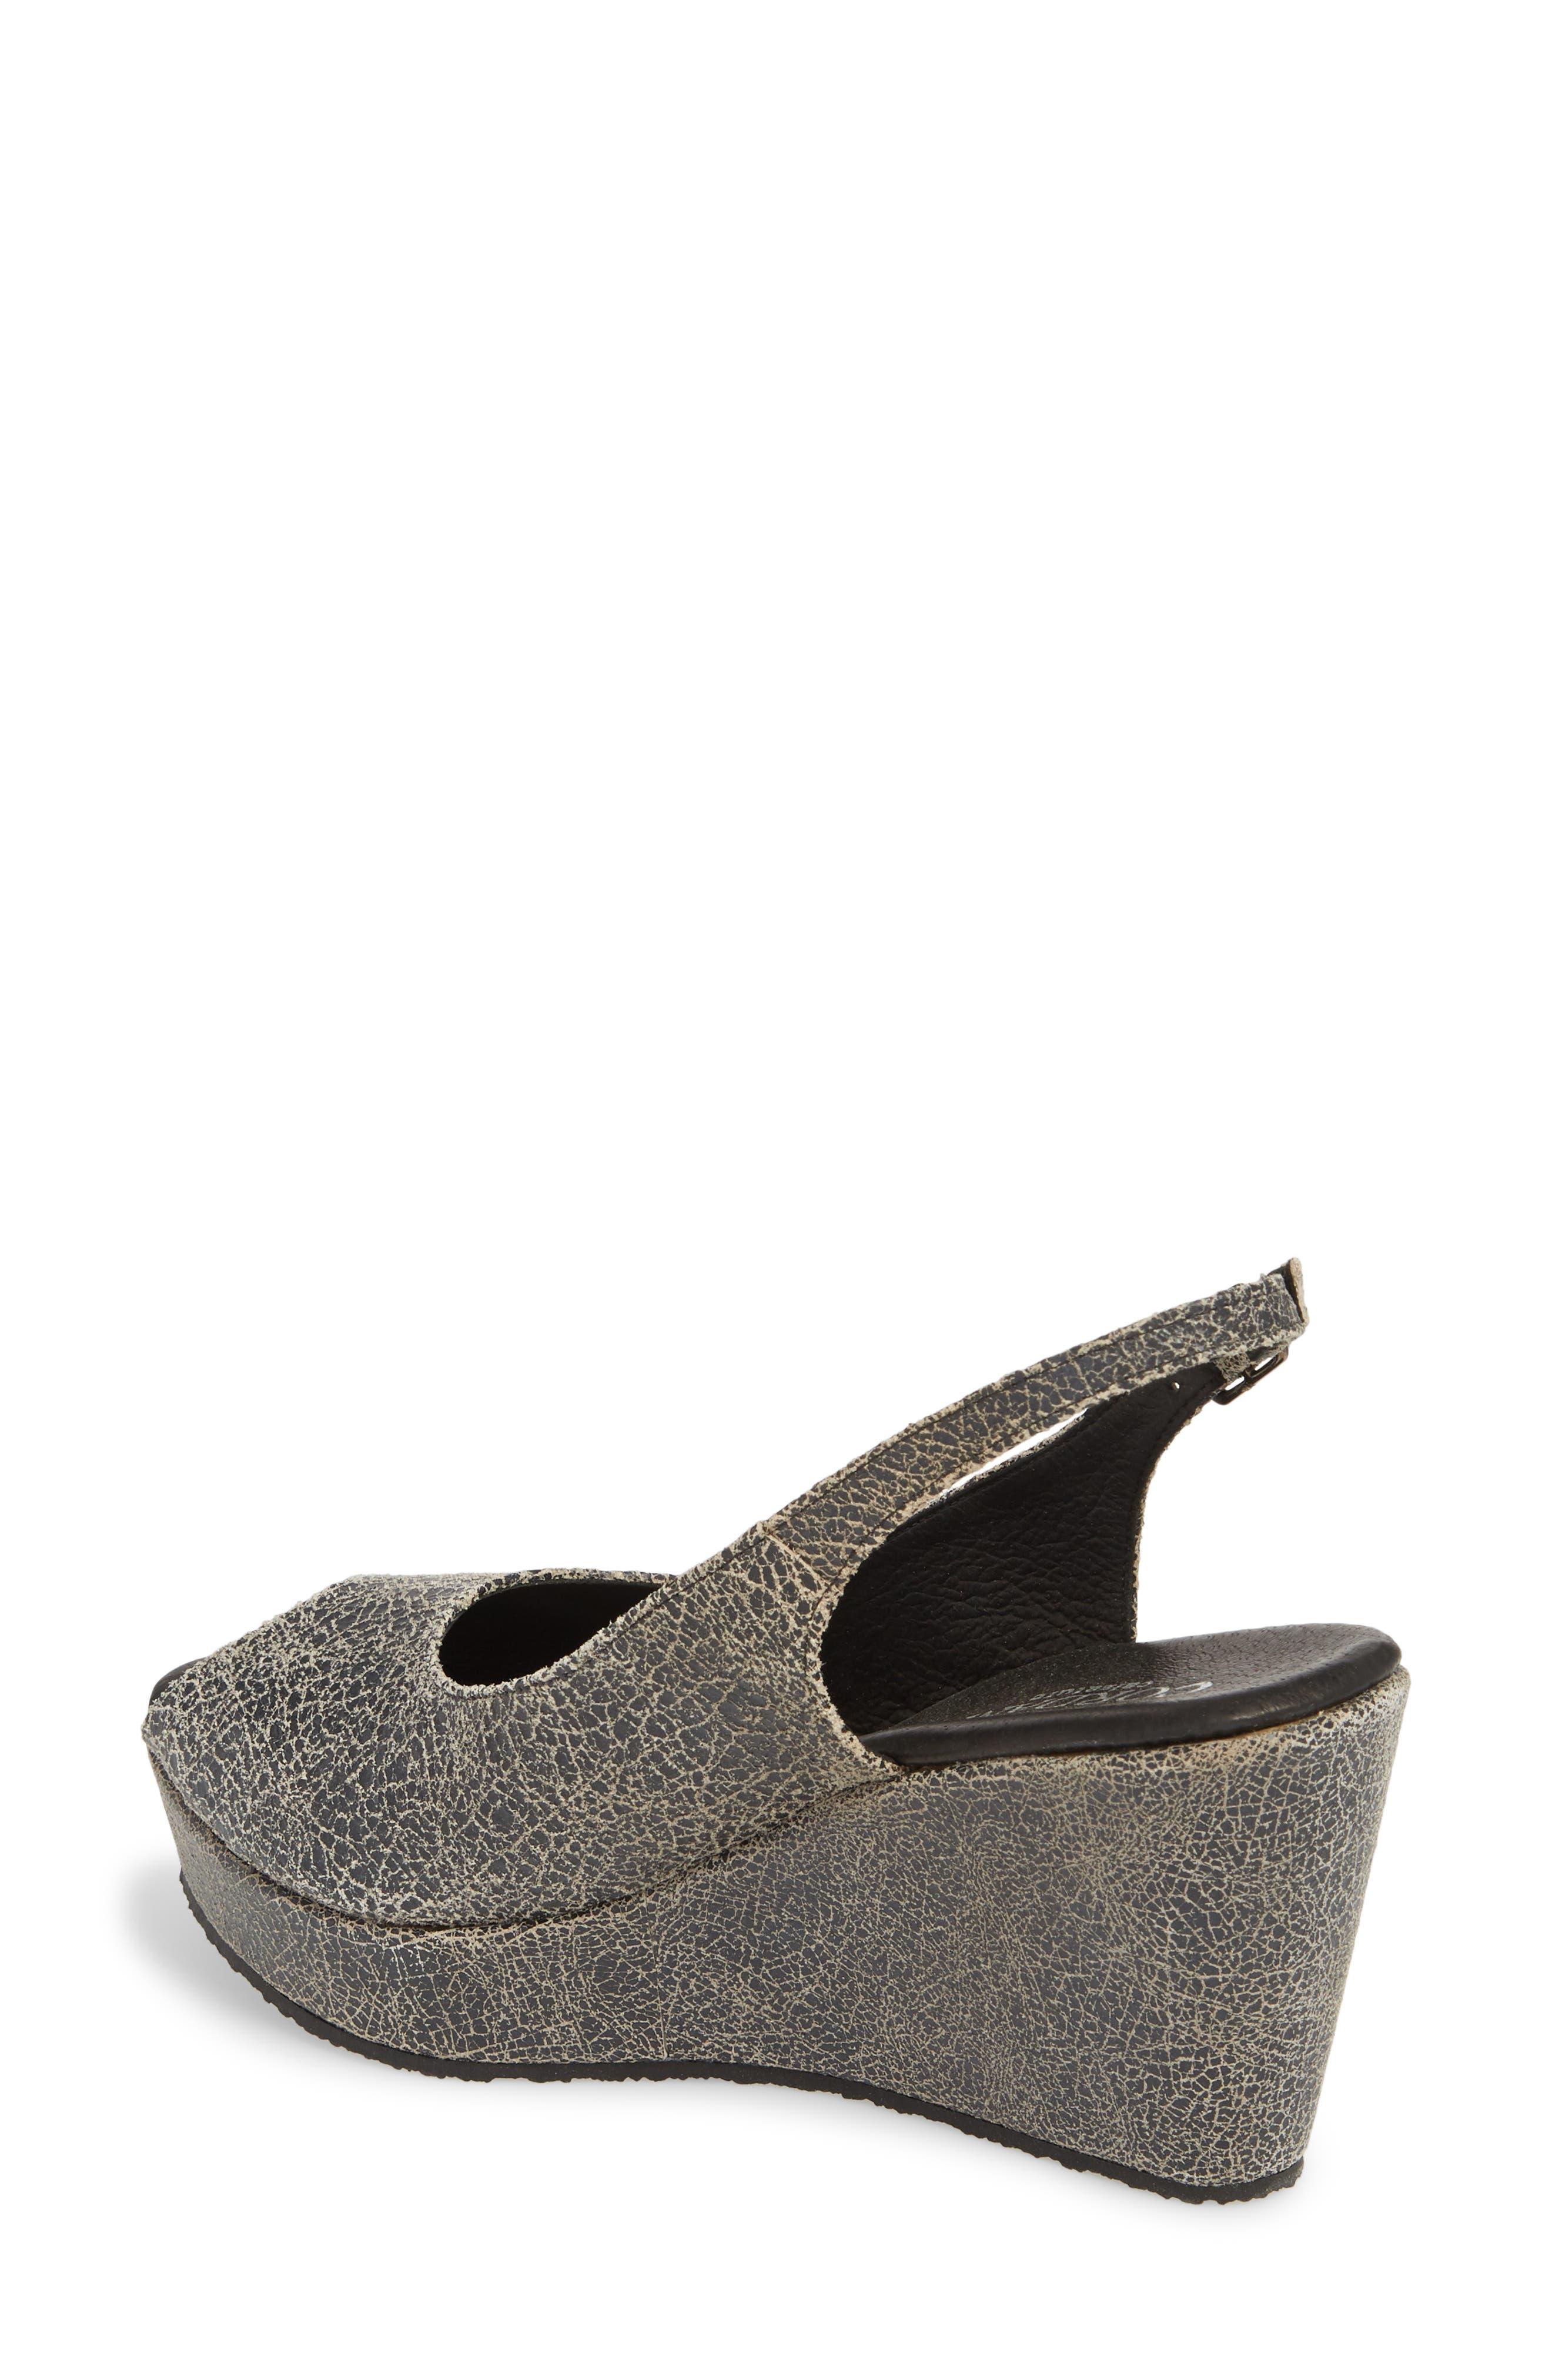 Fabrice Slingback Platform Sandal,                             Alternate thumbnail 2, color,                             Grey Crackle Leather